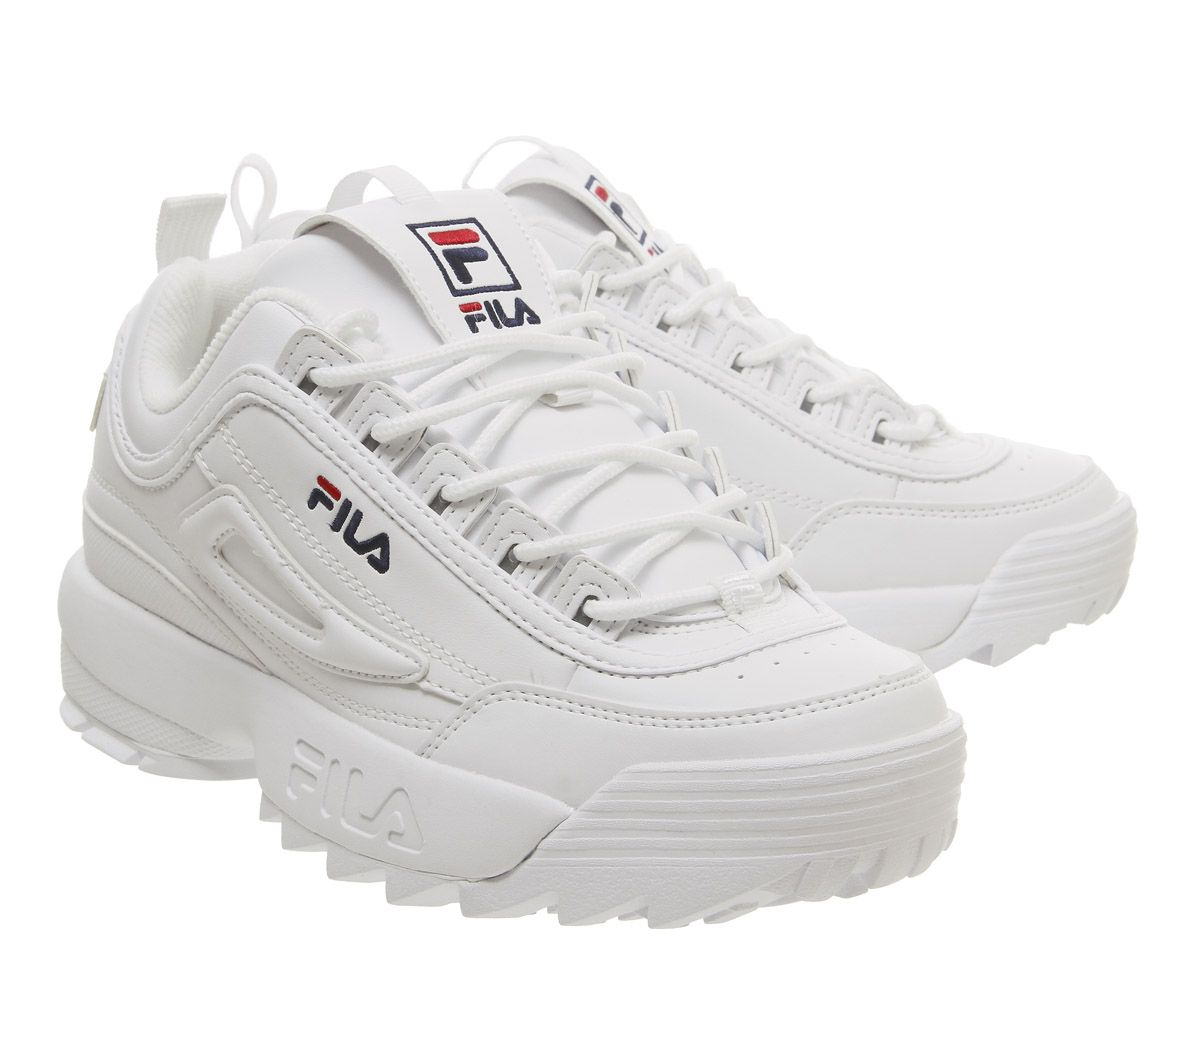 fdb59f87695 SENTINELLE Chaussures femme Fila Disruptor Ii formateurs en cuir blanc G  formateurs